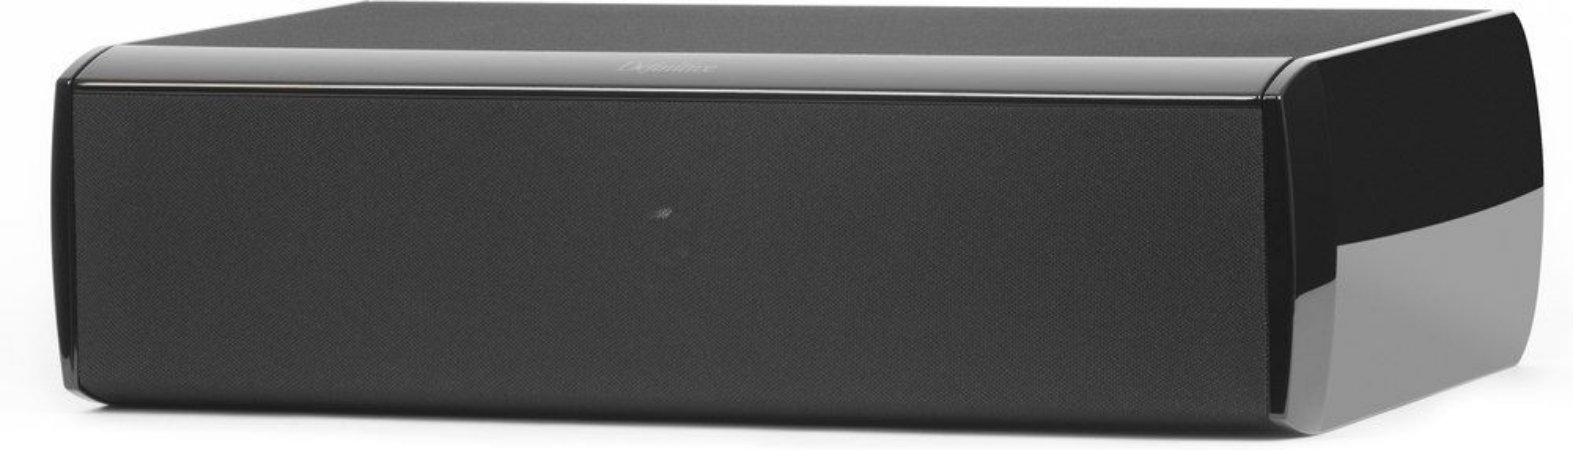 CS-8040HD - Definitive - Caixa central